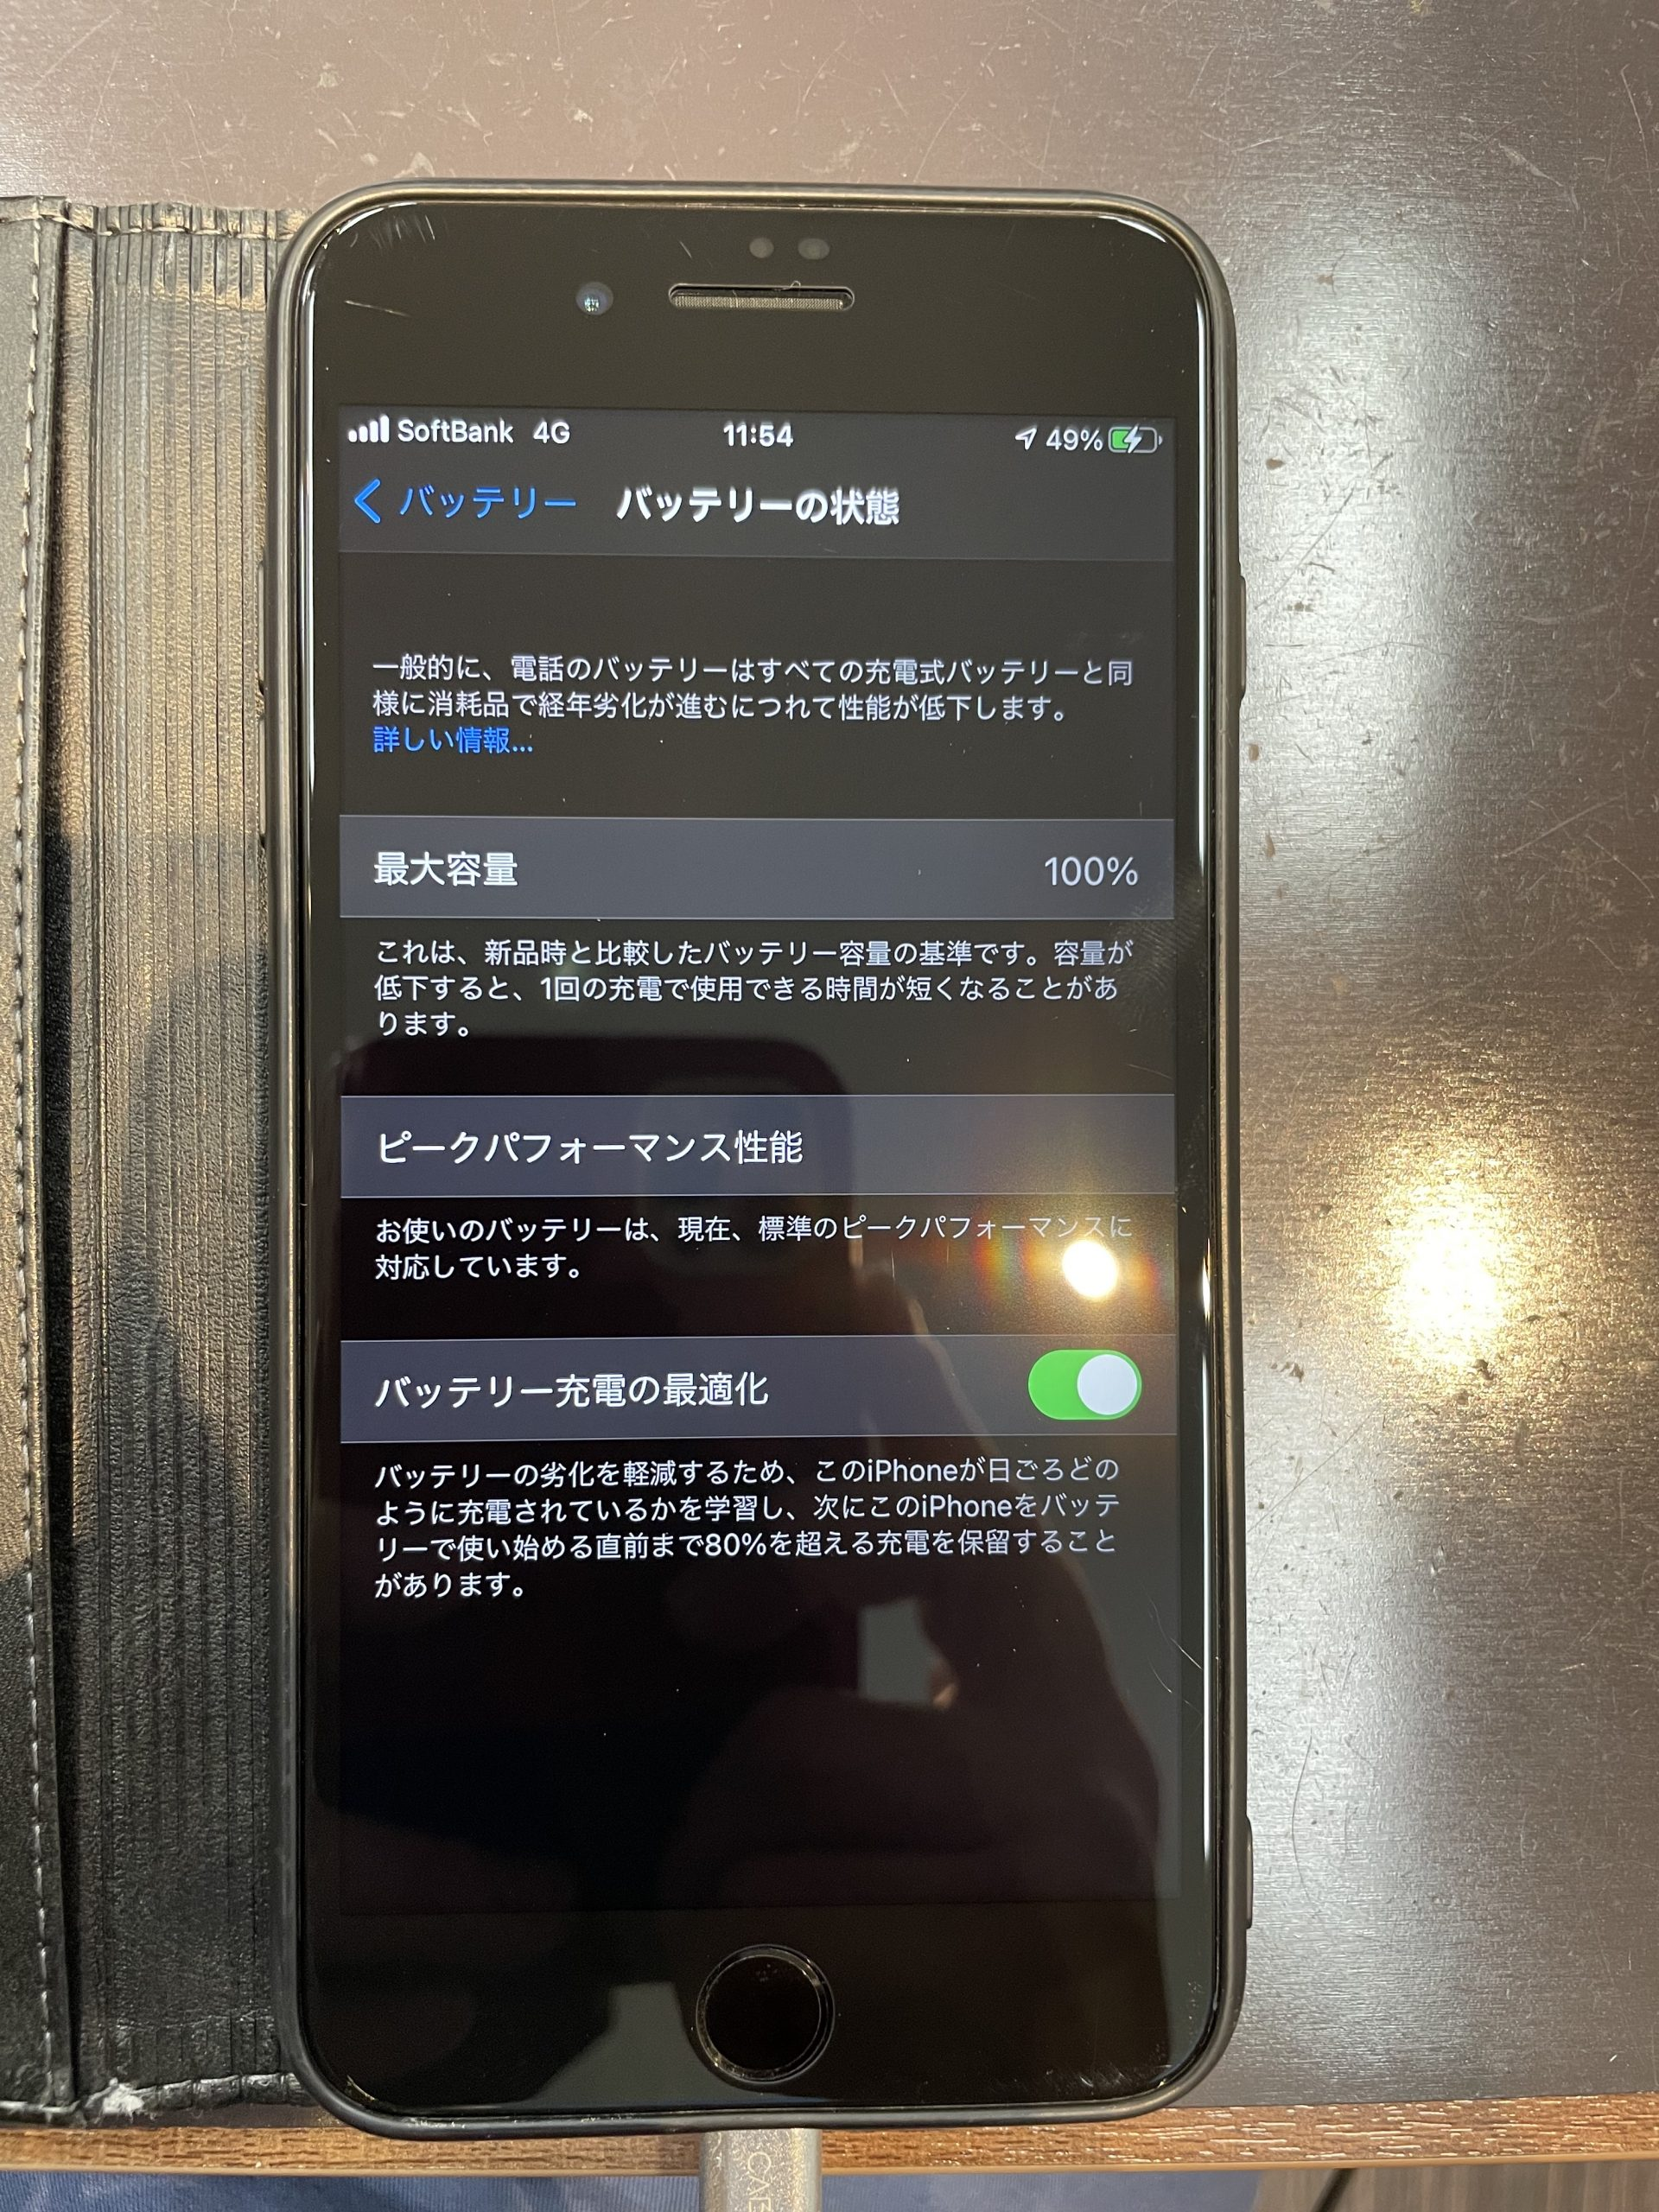 iPhone8バッテリー交換最短30分でできます‼️【iPhone8 バッテリー交換即日修理】